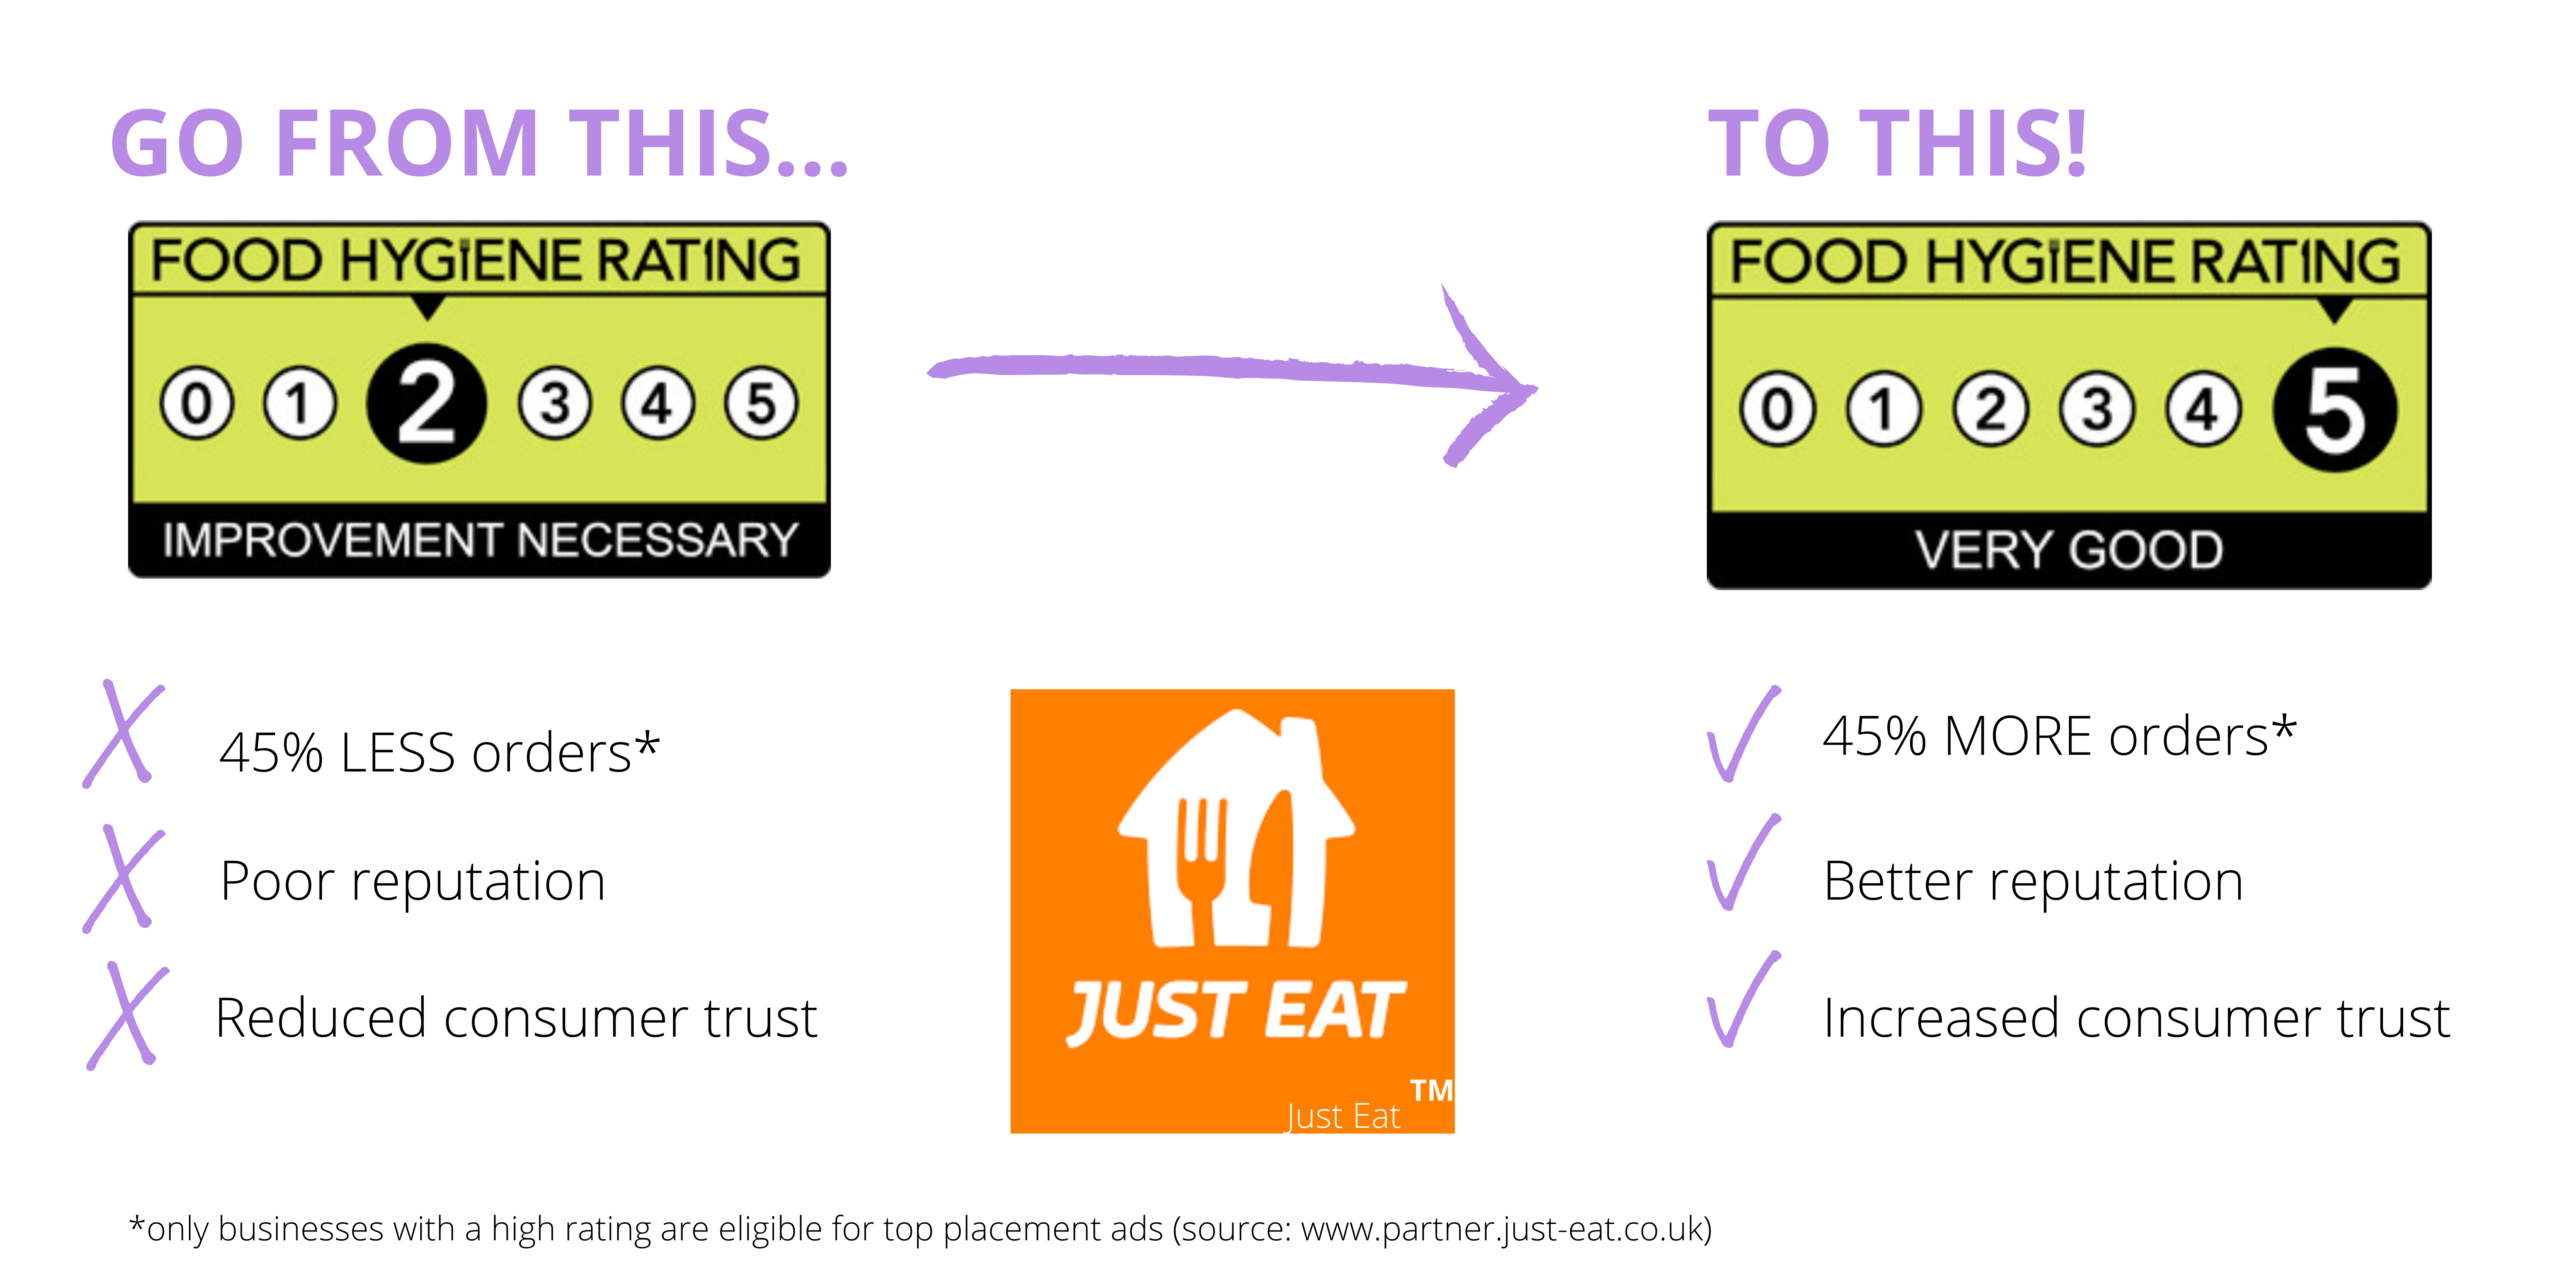 just-eat-fhrs-banner